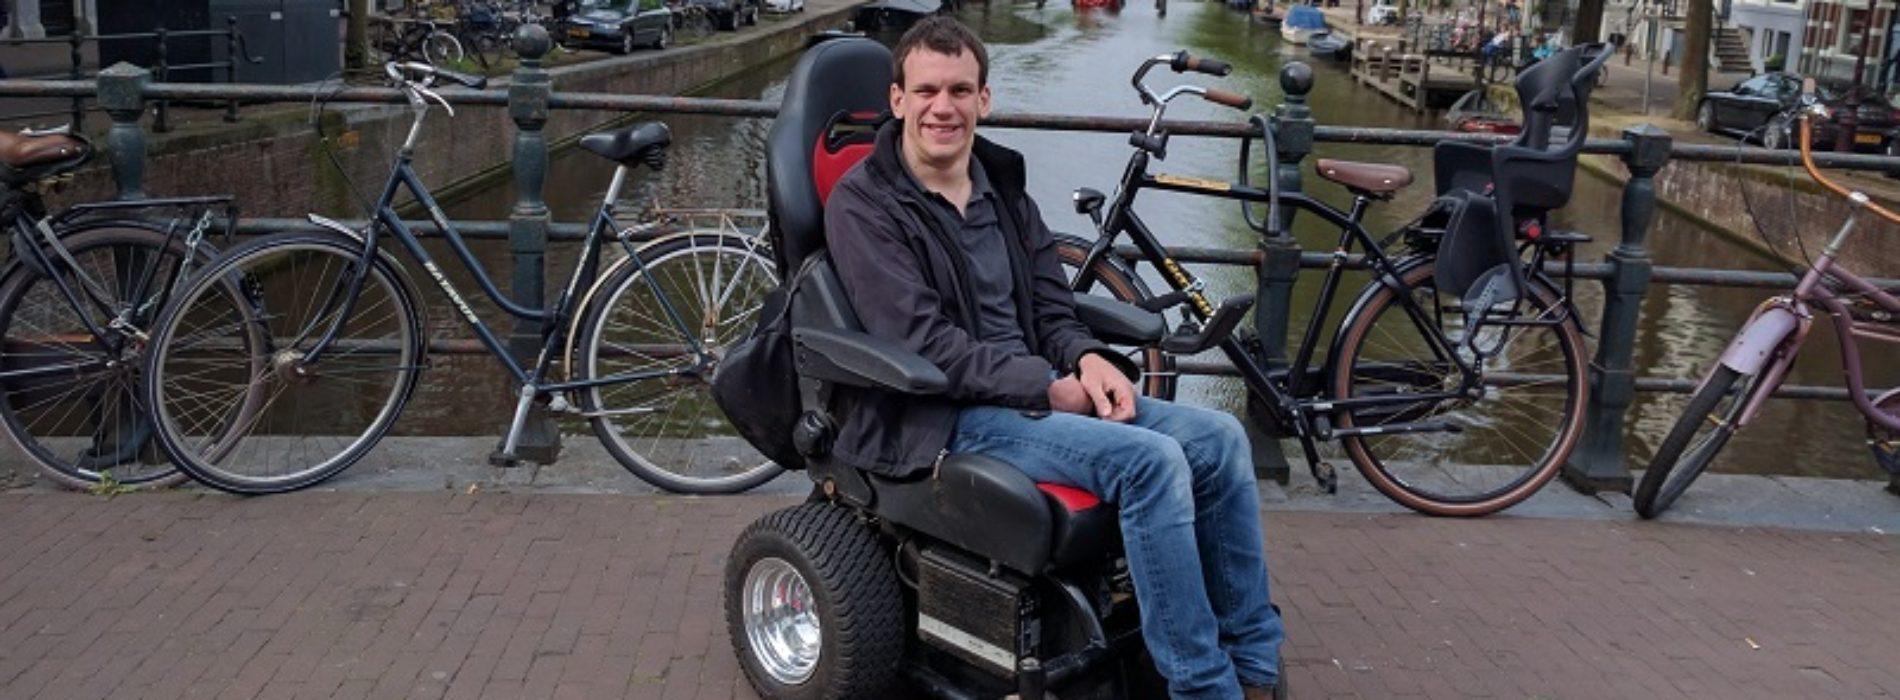 Power wheelchairs: one entrepreneur is revolutionising the market